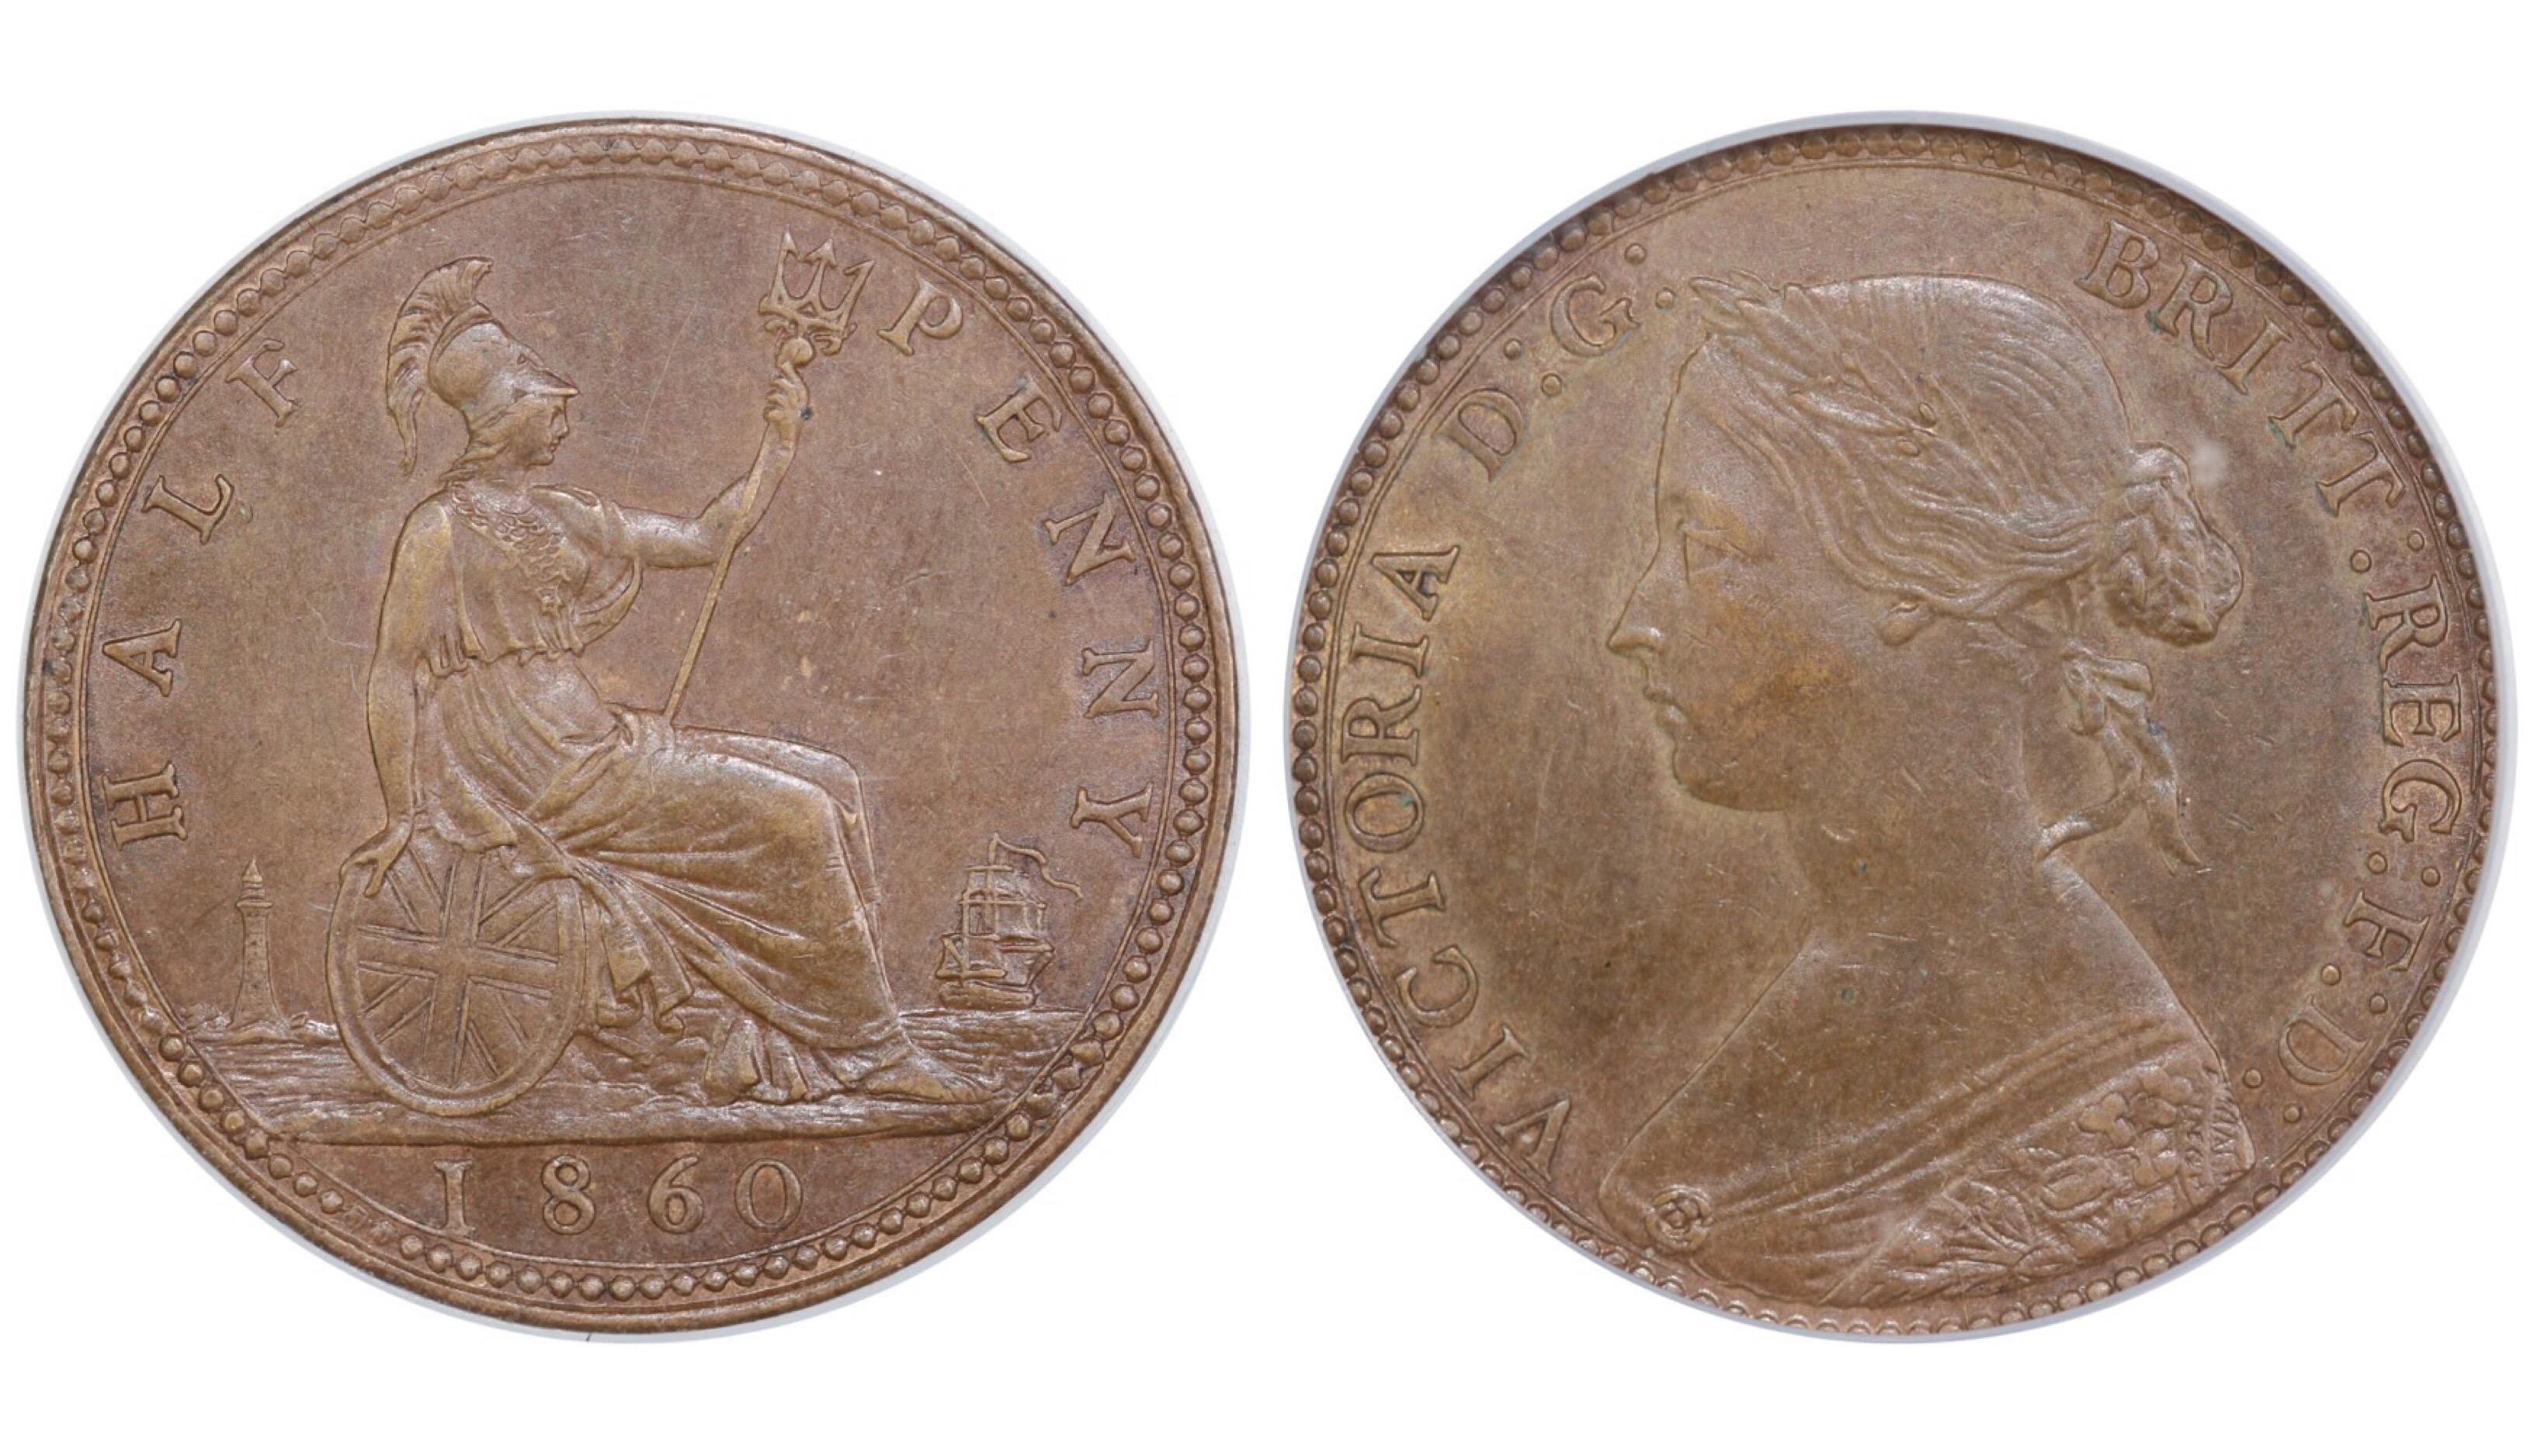 1860 Halfpenny, CGS 65, Victoria, Freeman 258, UIN 23286